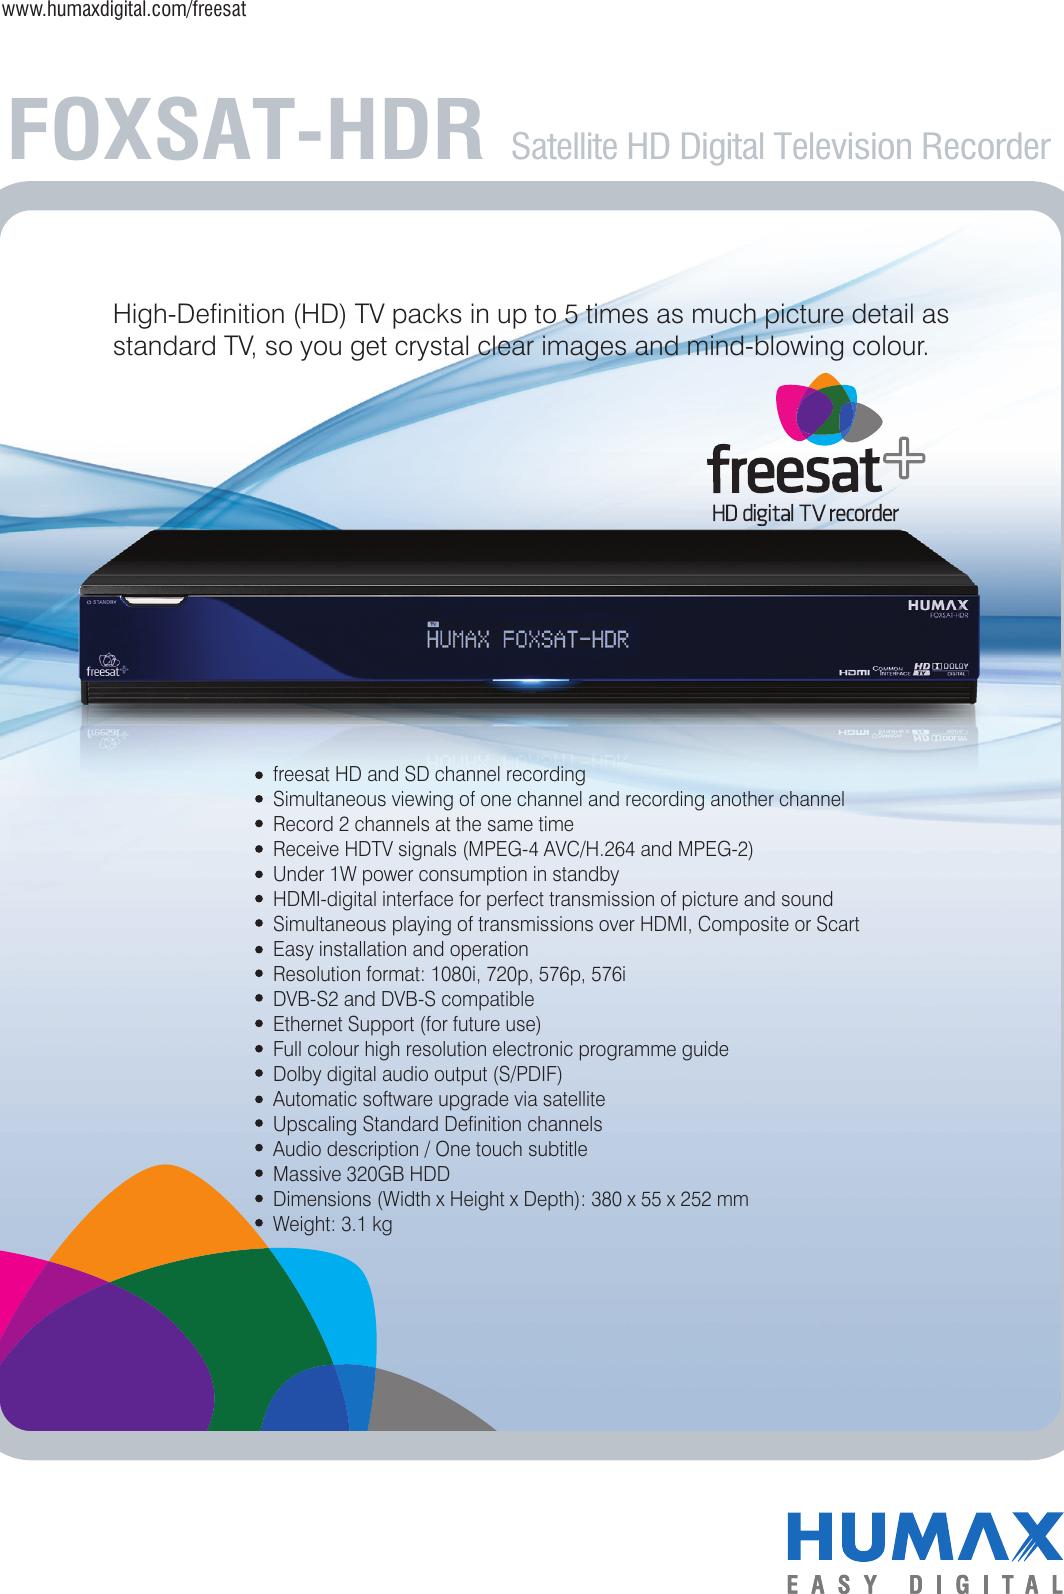 Humax Foxsat Hdr Users Manual HDR_leaflet_1